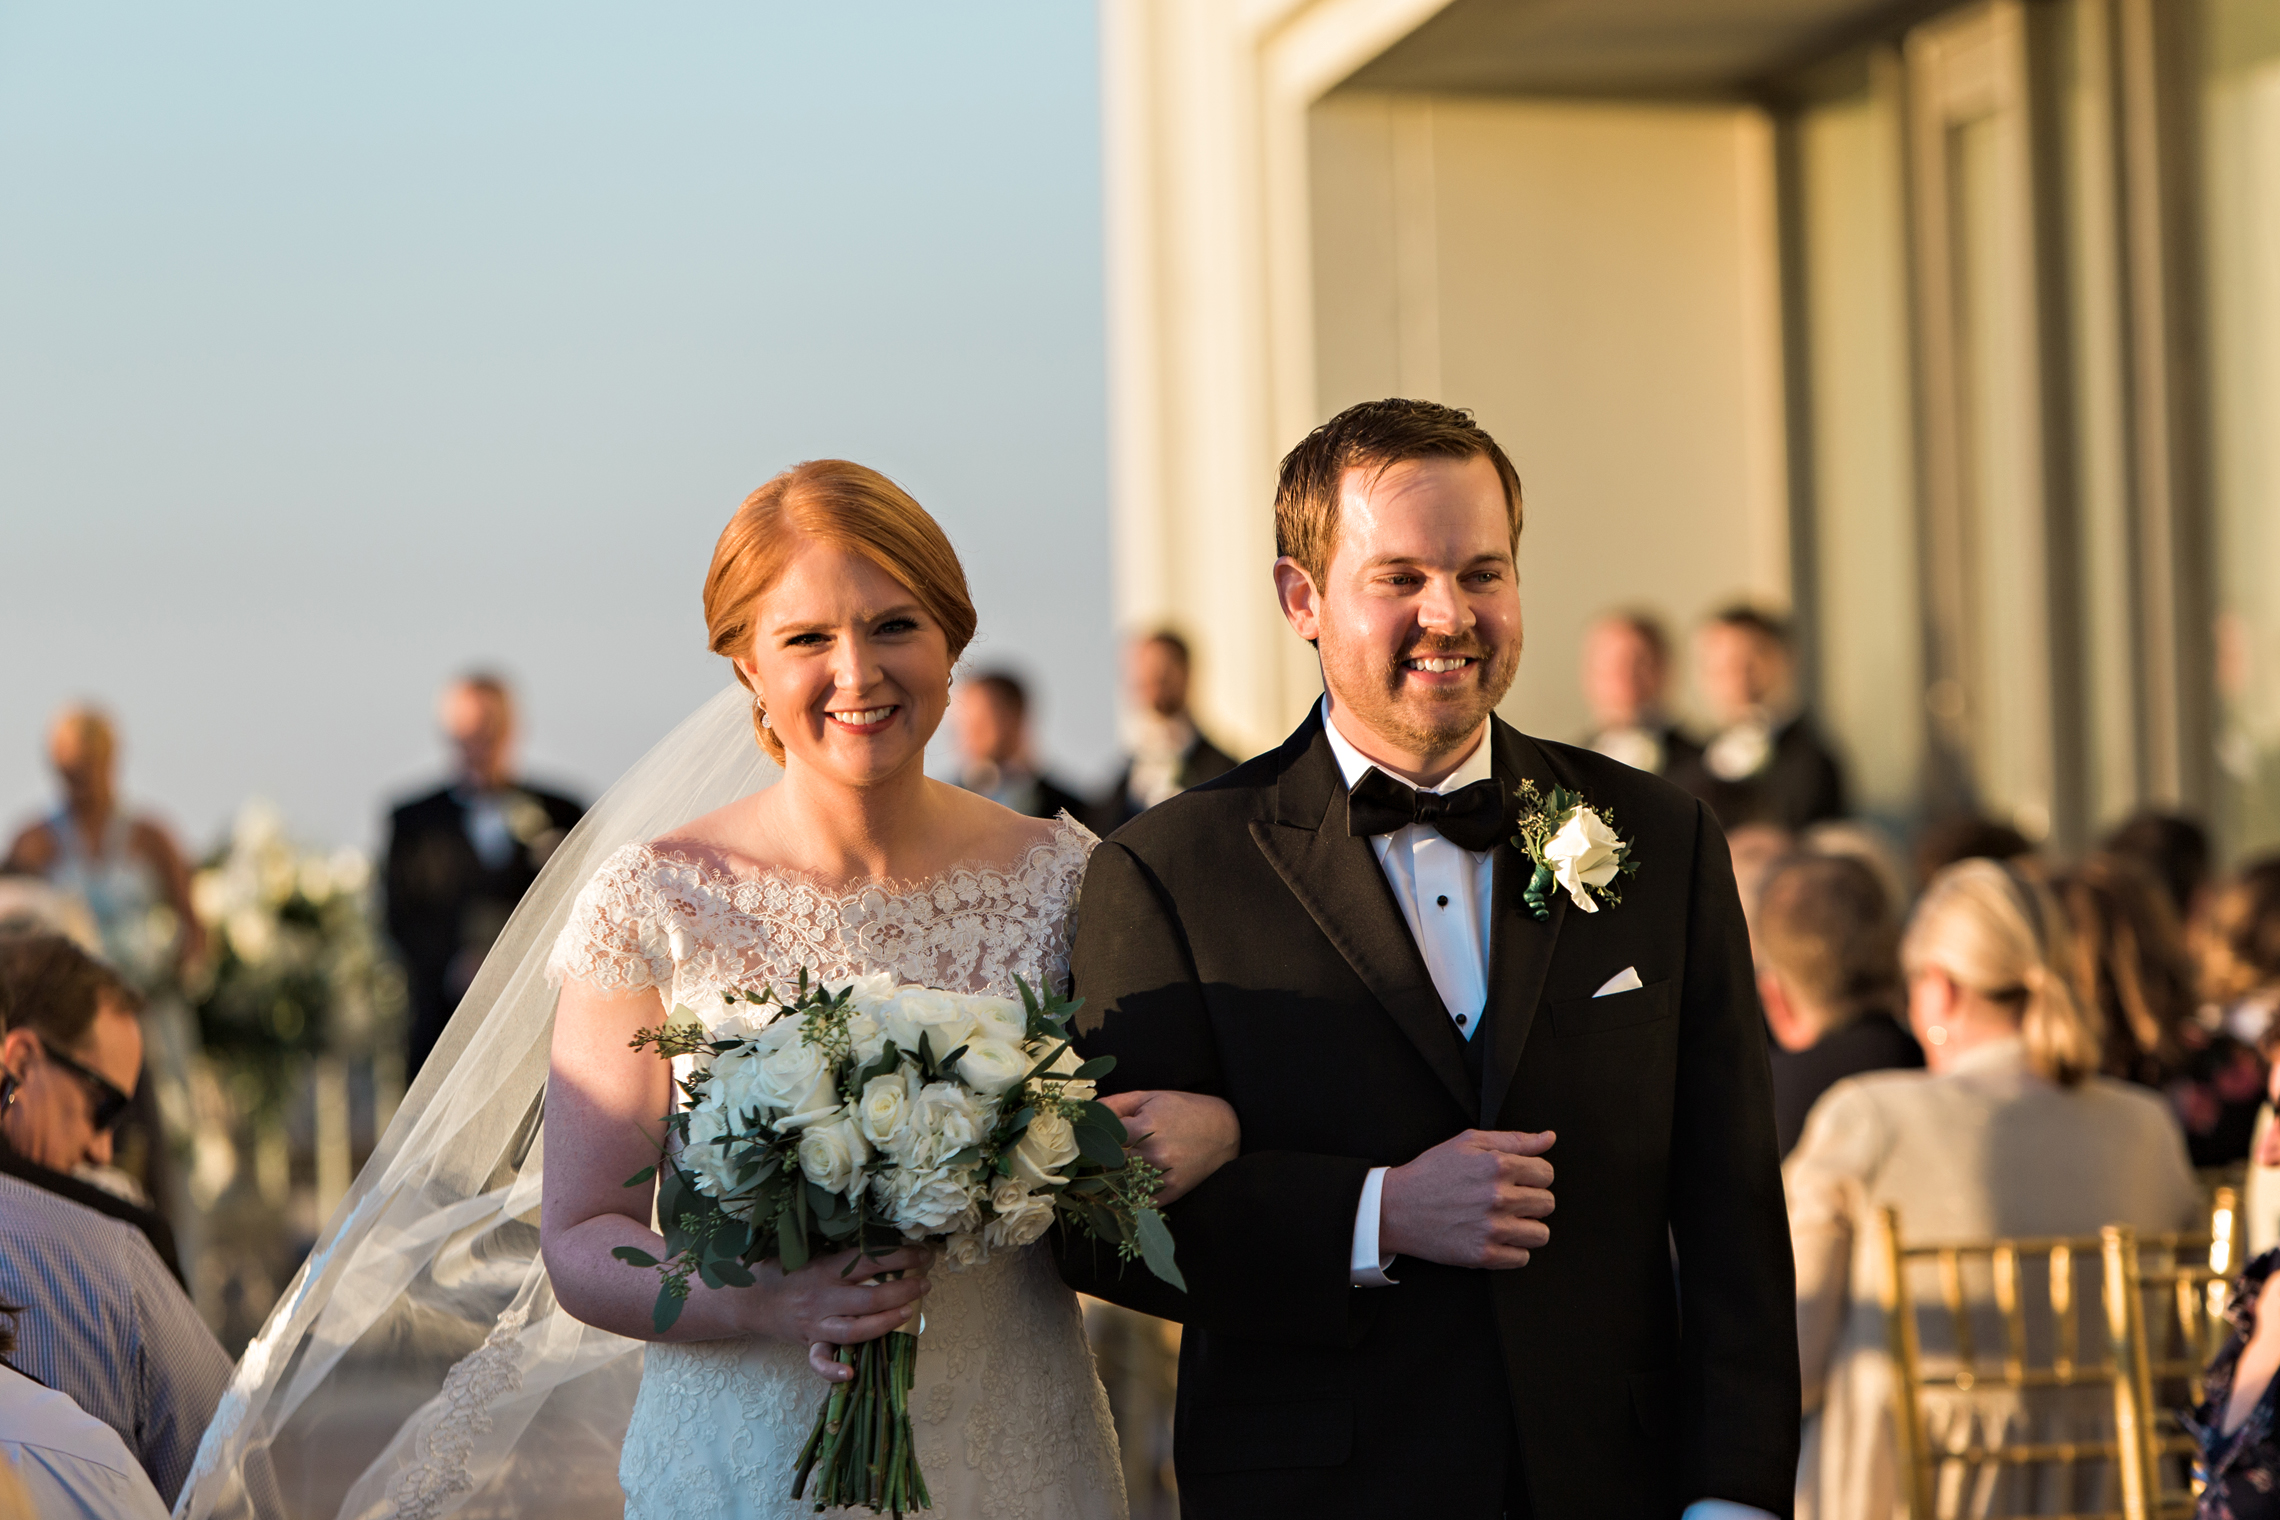 Matty-Drollette-Photography-Weddings-Montgomery-Alabama-129.jpg